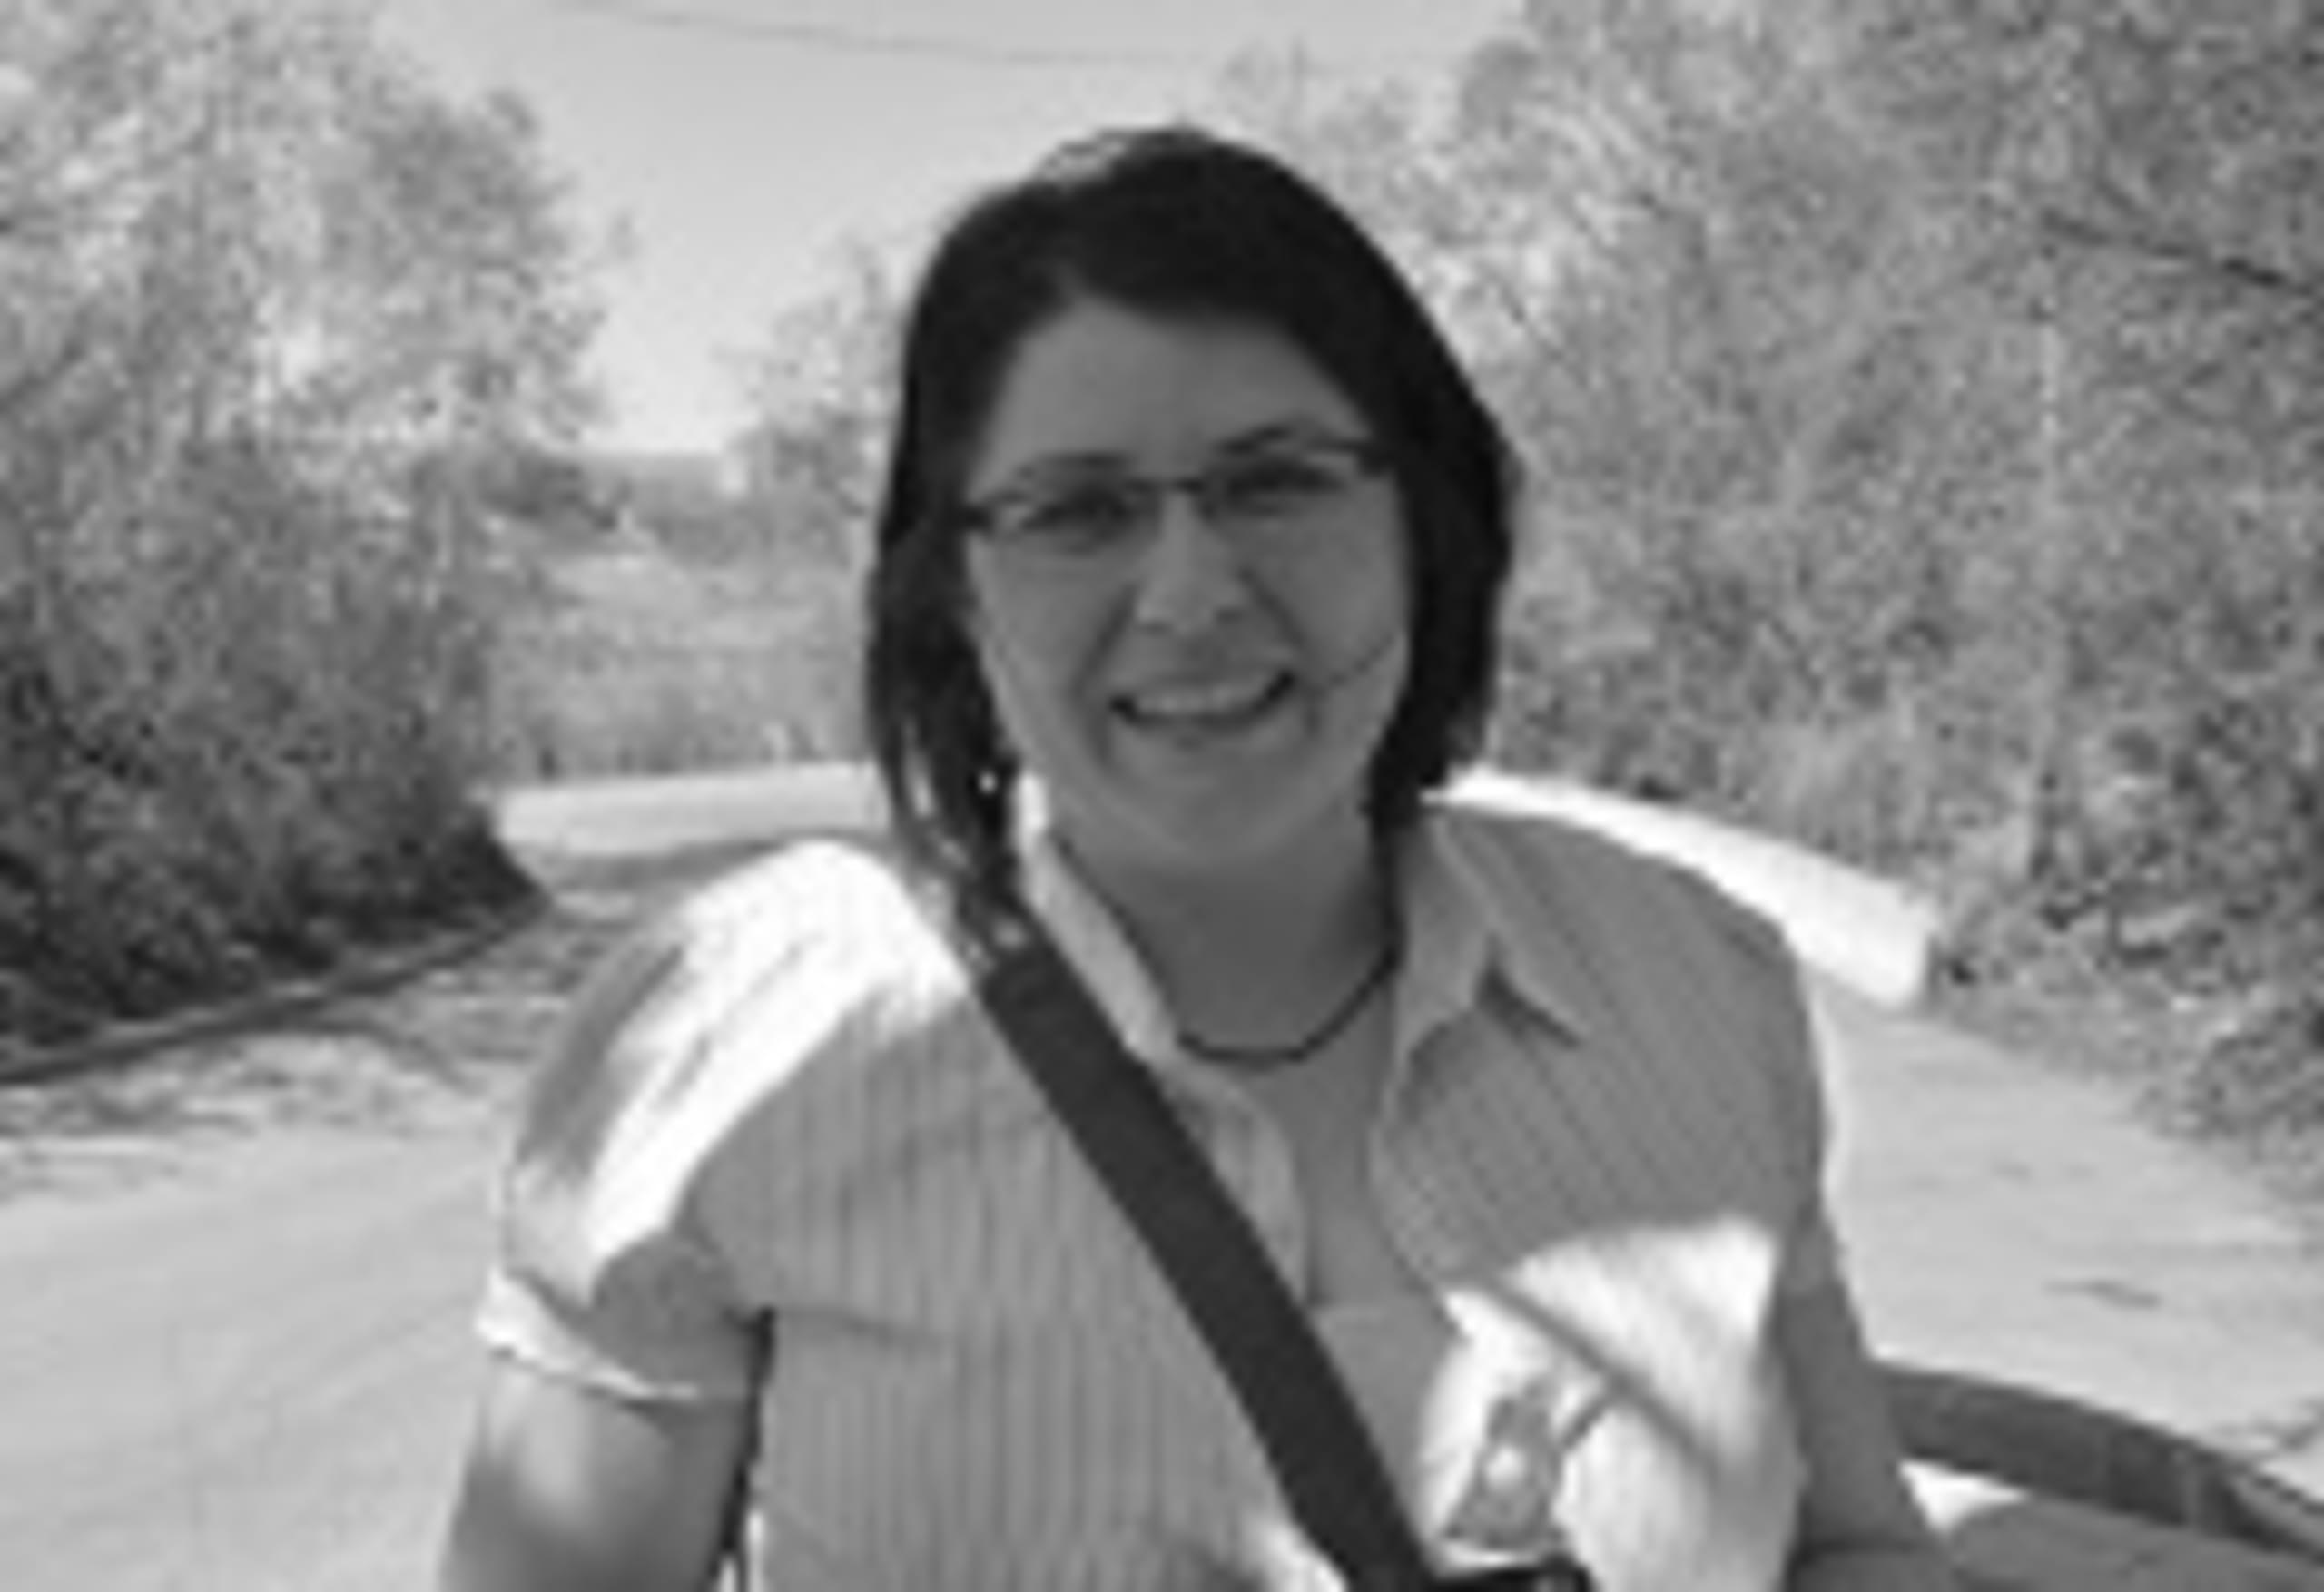 Vanessa Chiasson